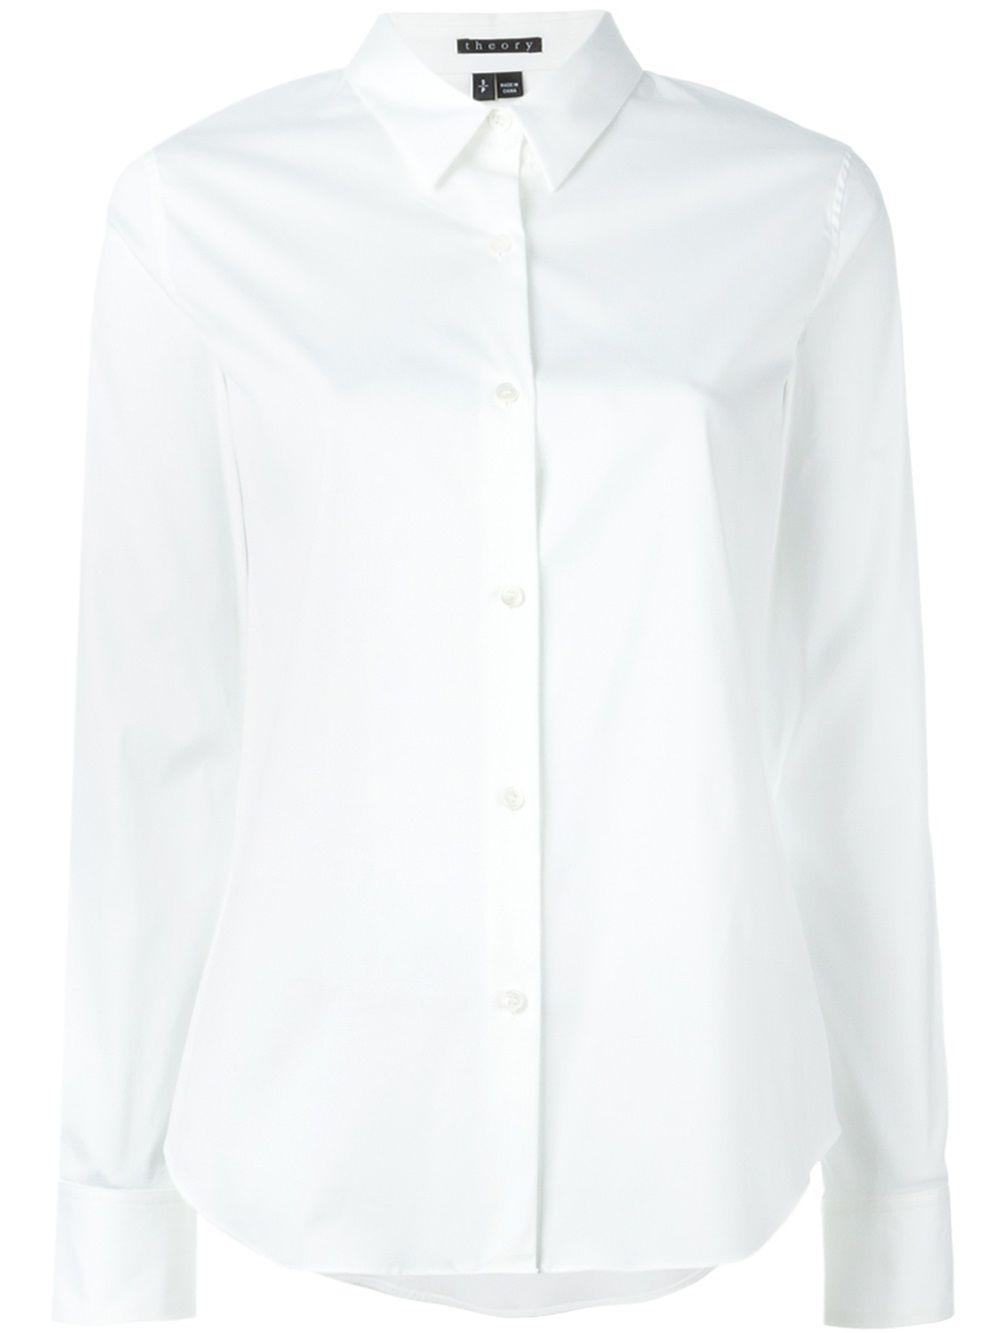 Tenia Cotton Luxe Buttondown Shirt Item # F0004501